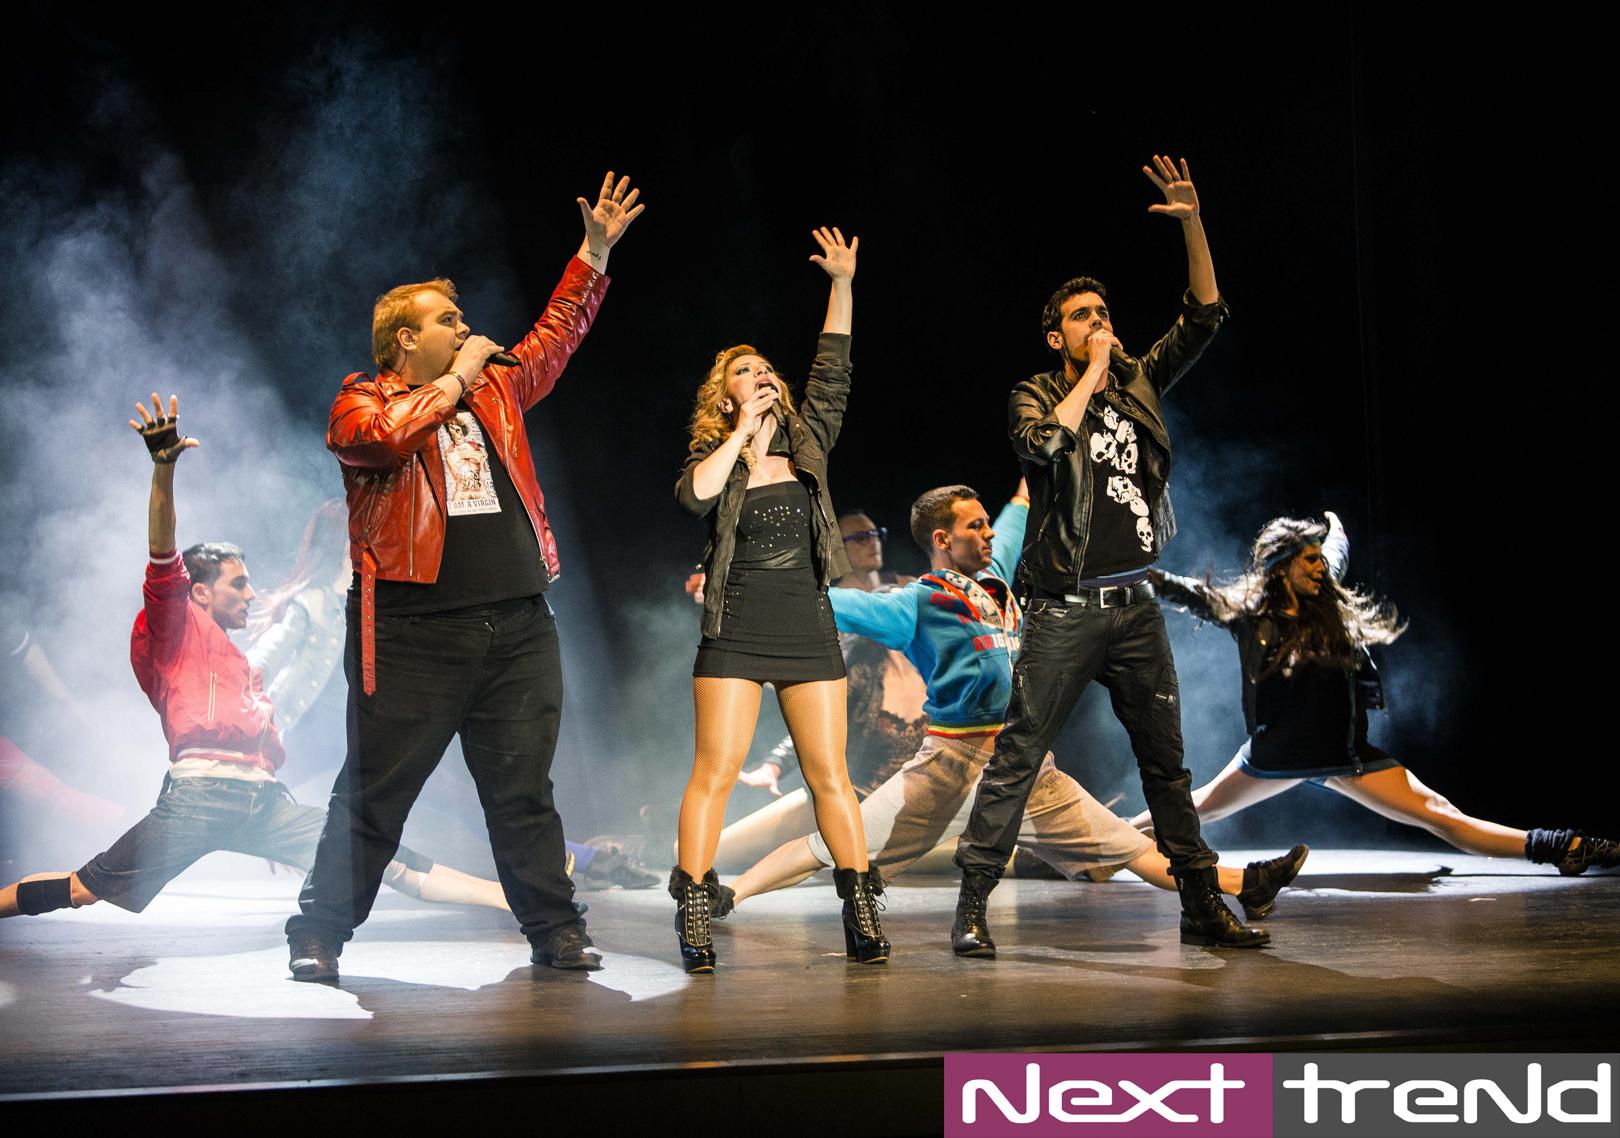 tivoli-barcelona-fuerza-destino-mecano-teatro-musical-nexttrend